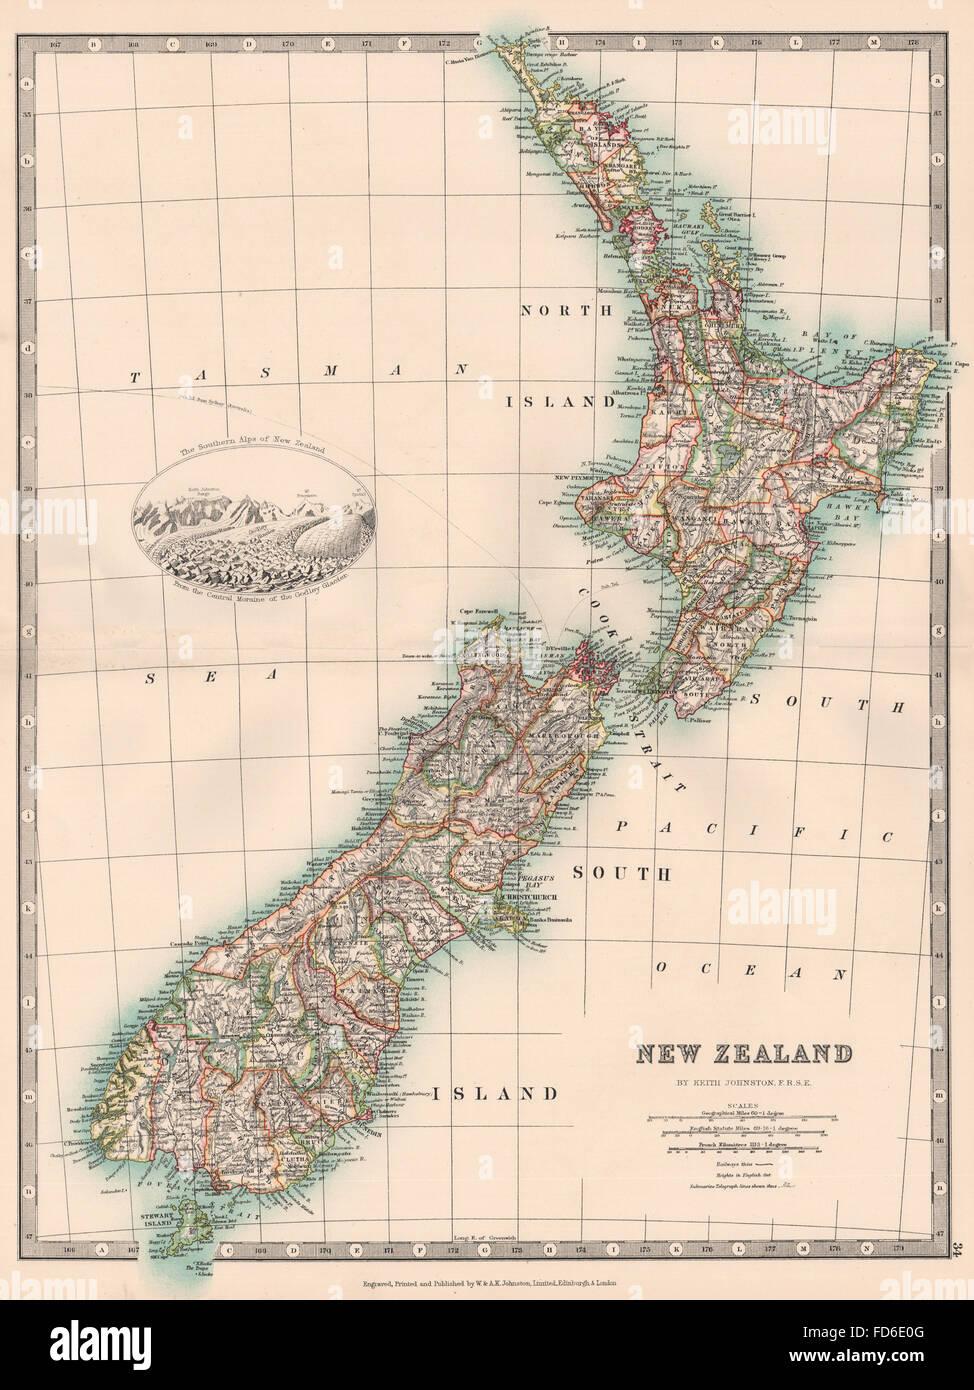 Southern Alps New Zealand Map.New Zealand Southern Alps Godley Glacier Vignette Stock Photo